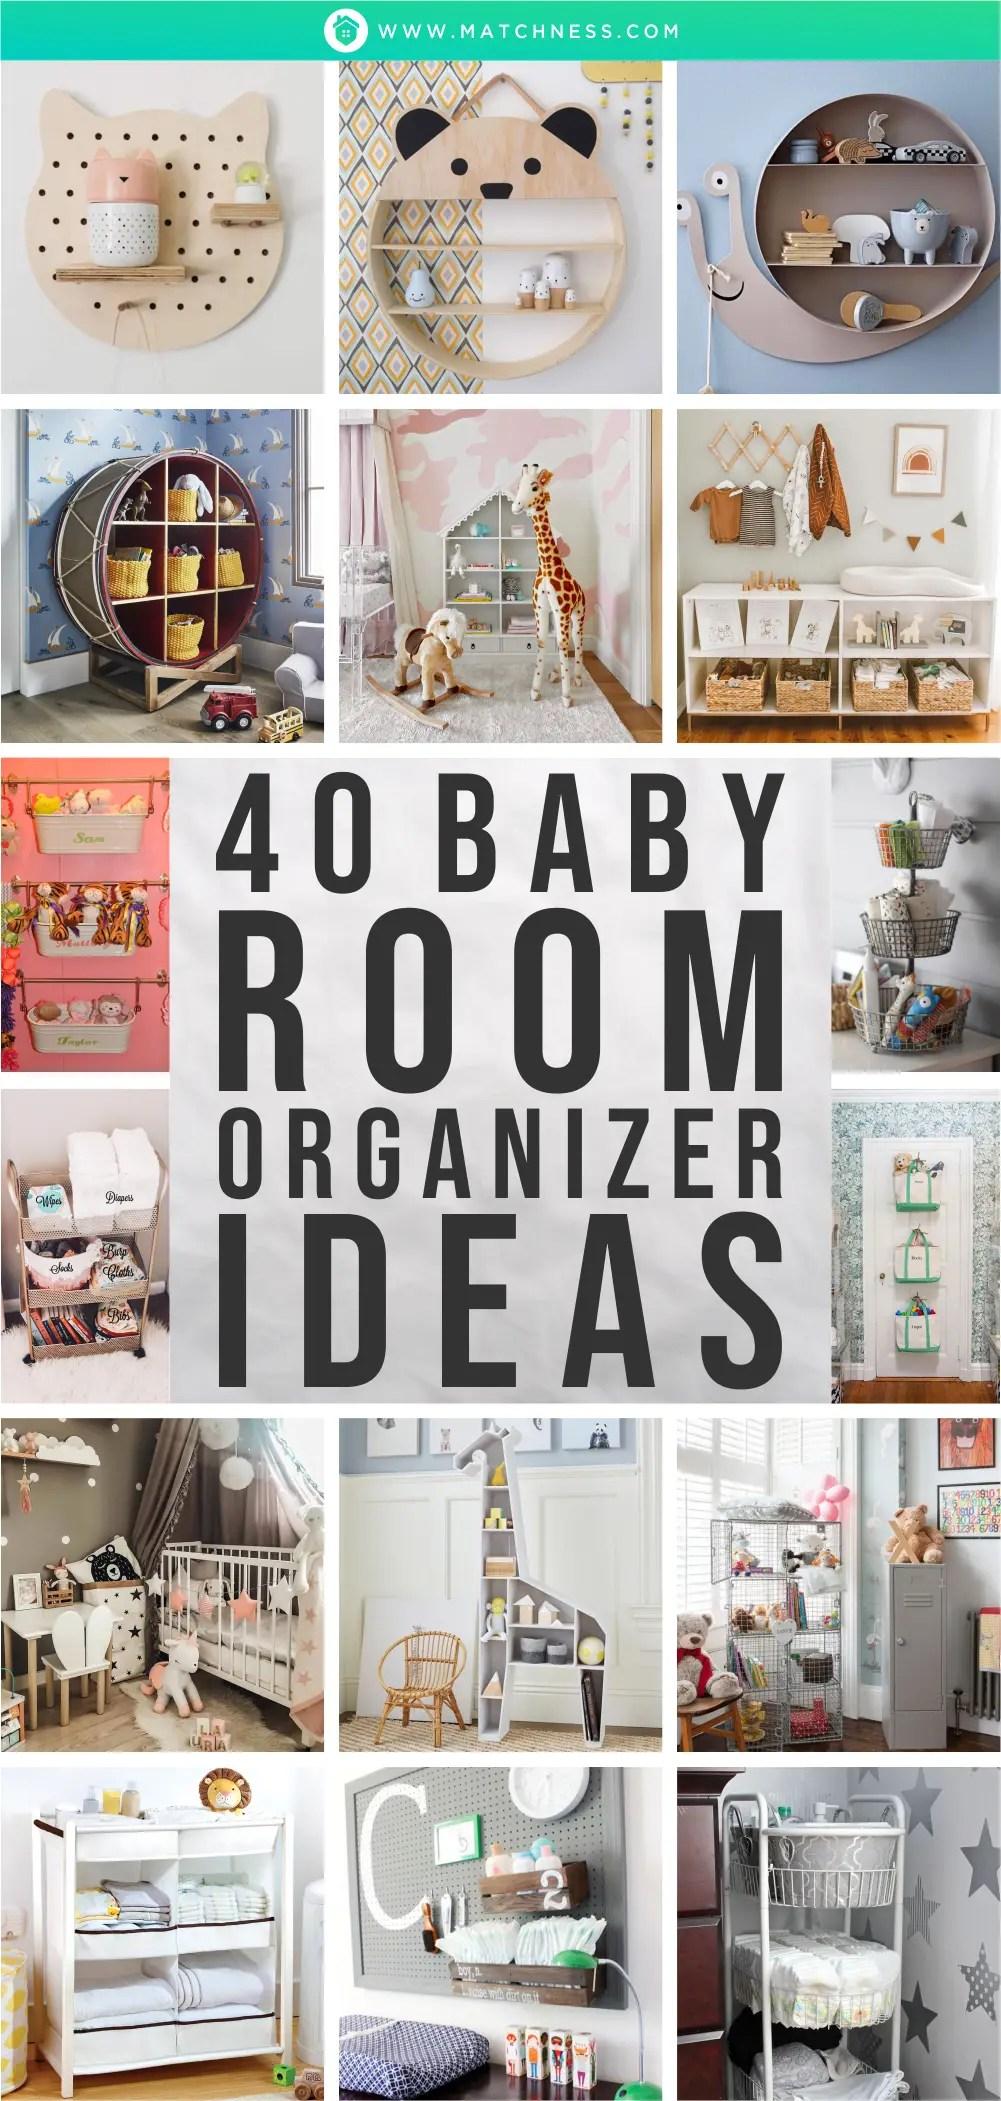 40-baby-room-organizer-ideas1